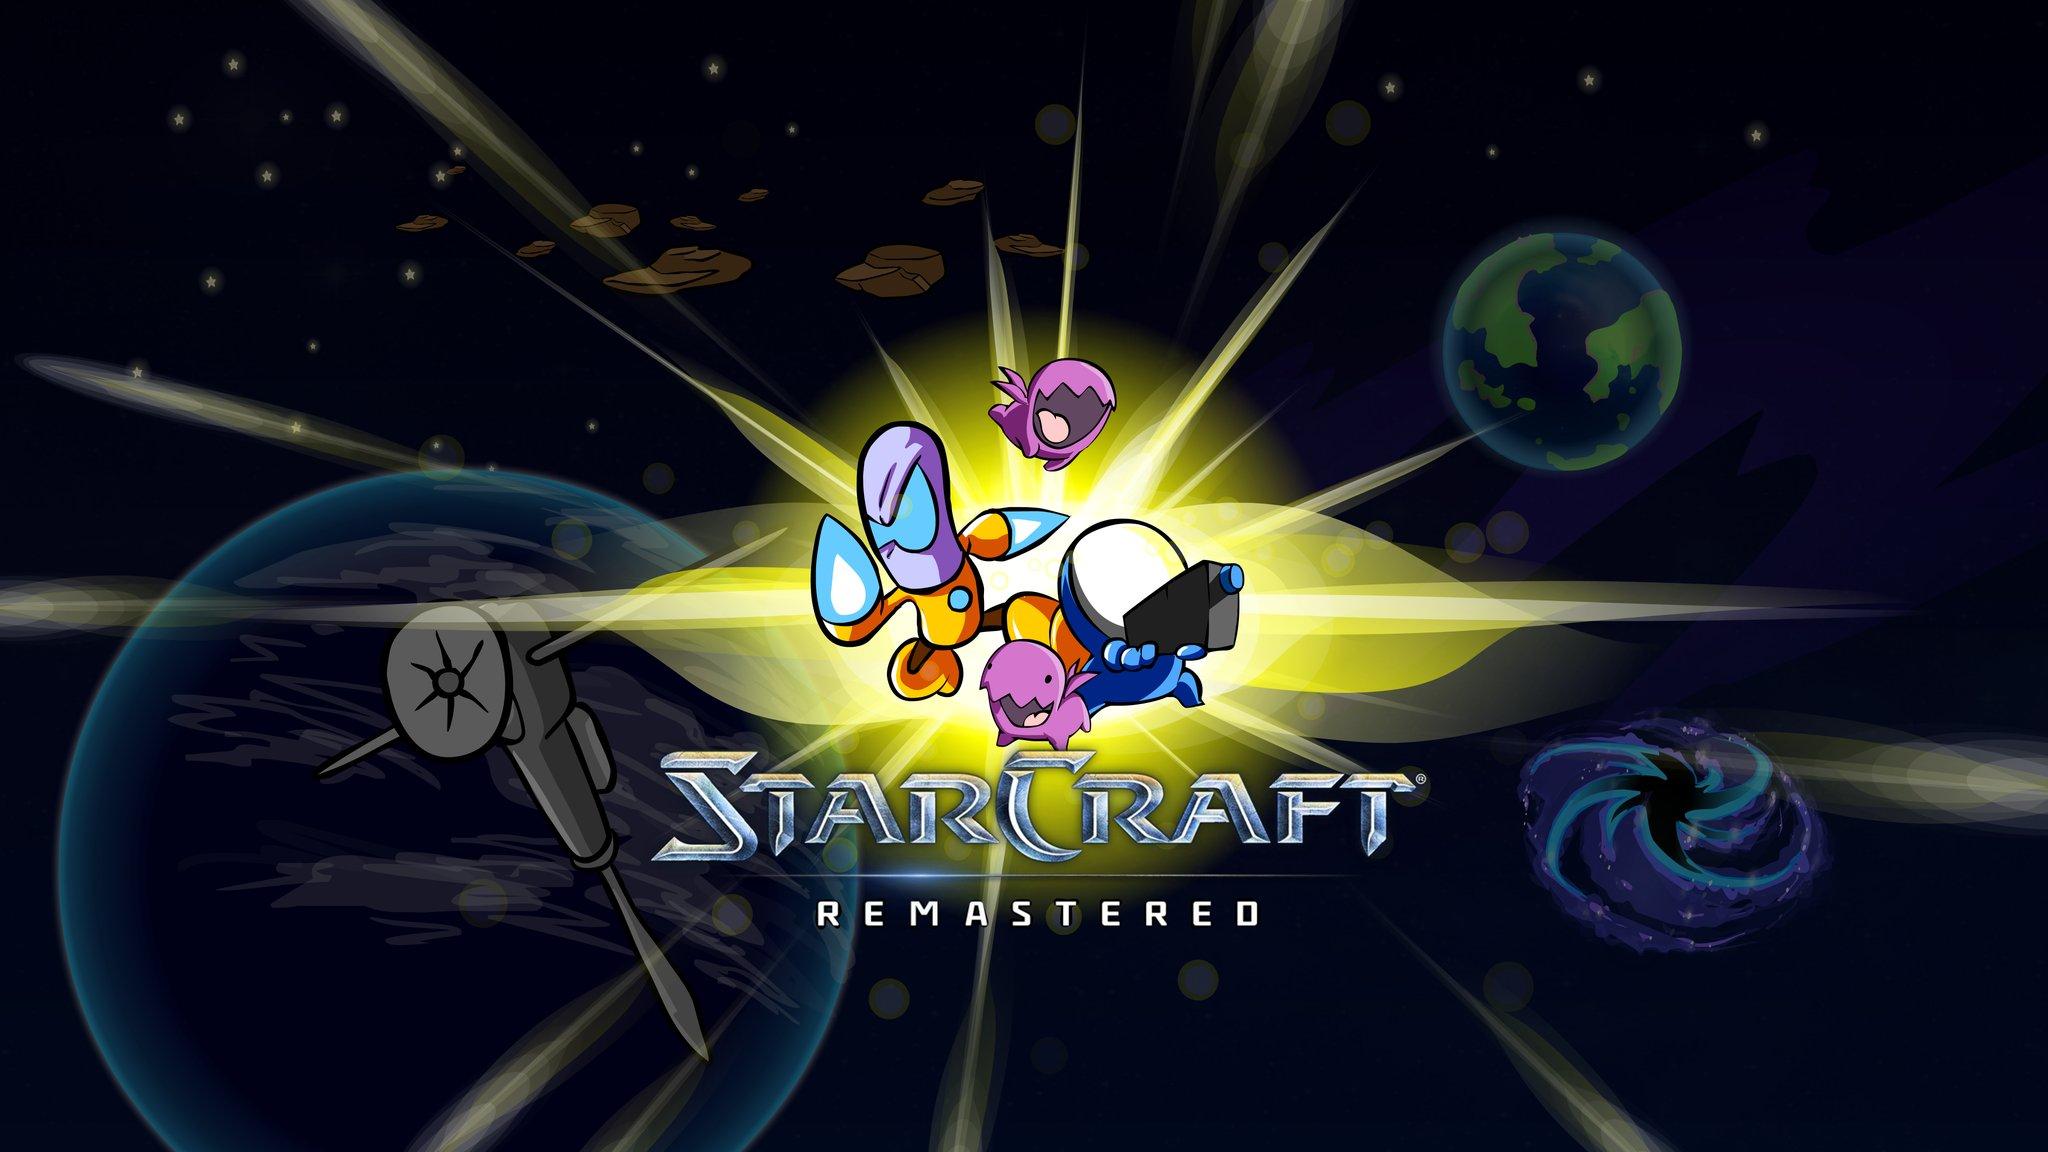 StarCraft: Remastered is getting a cartoon reskin | PC Gamer